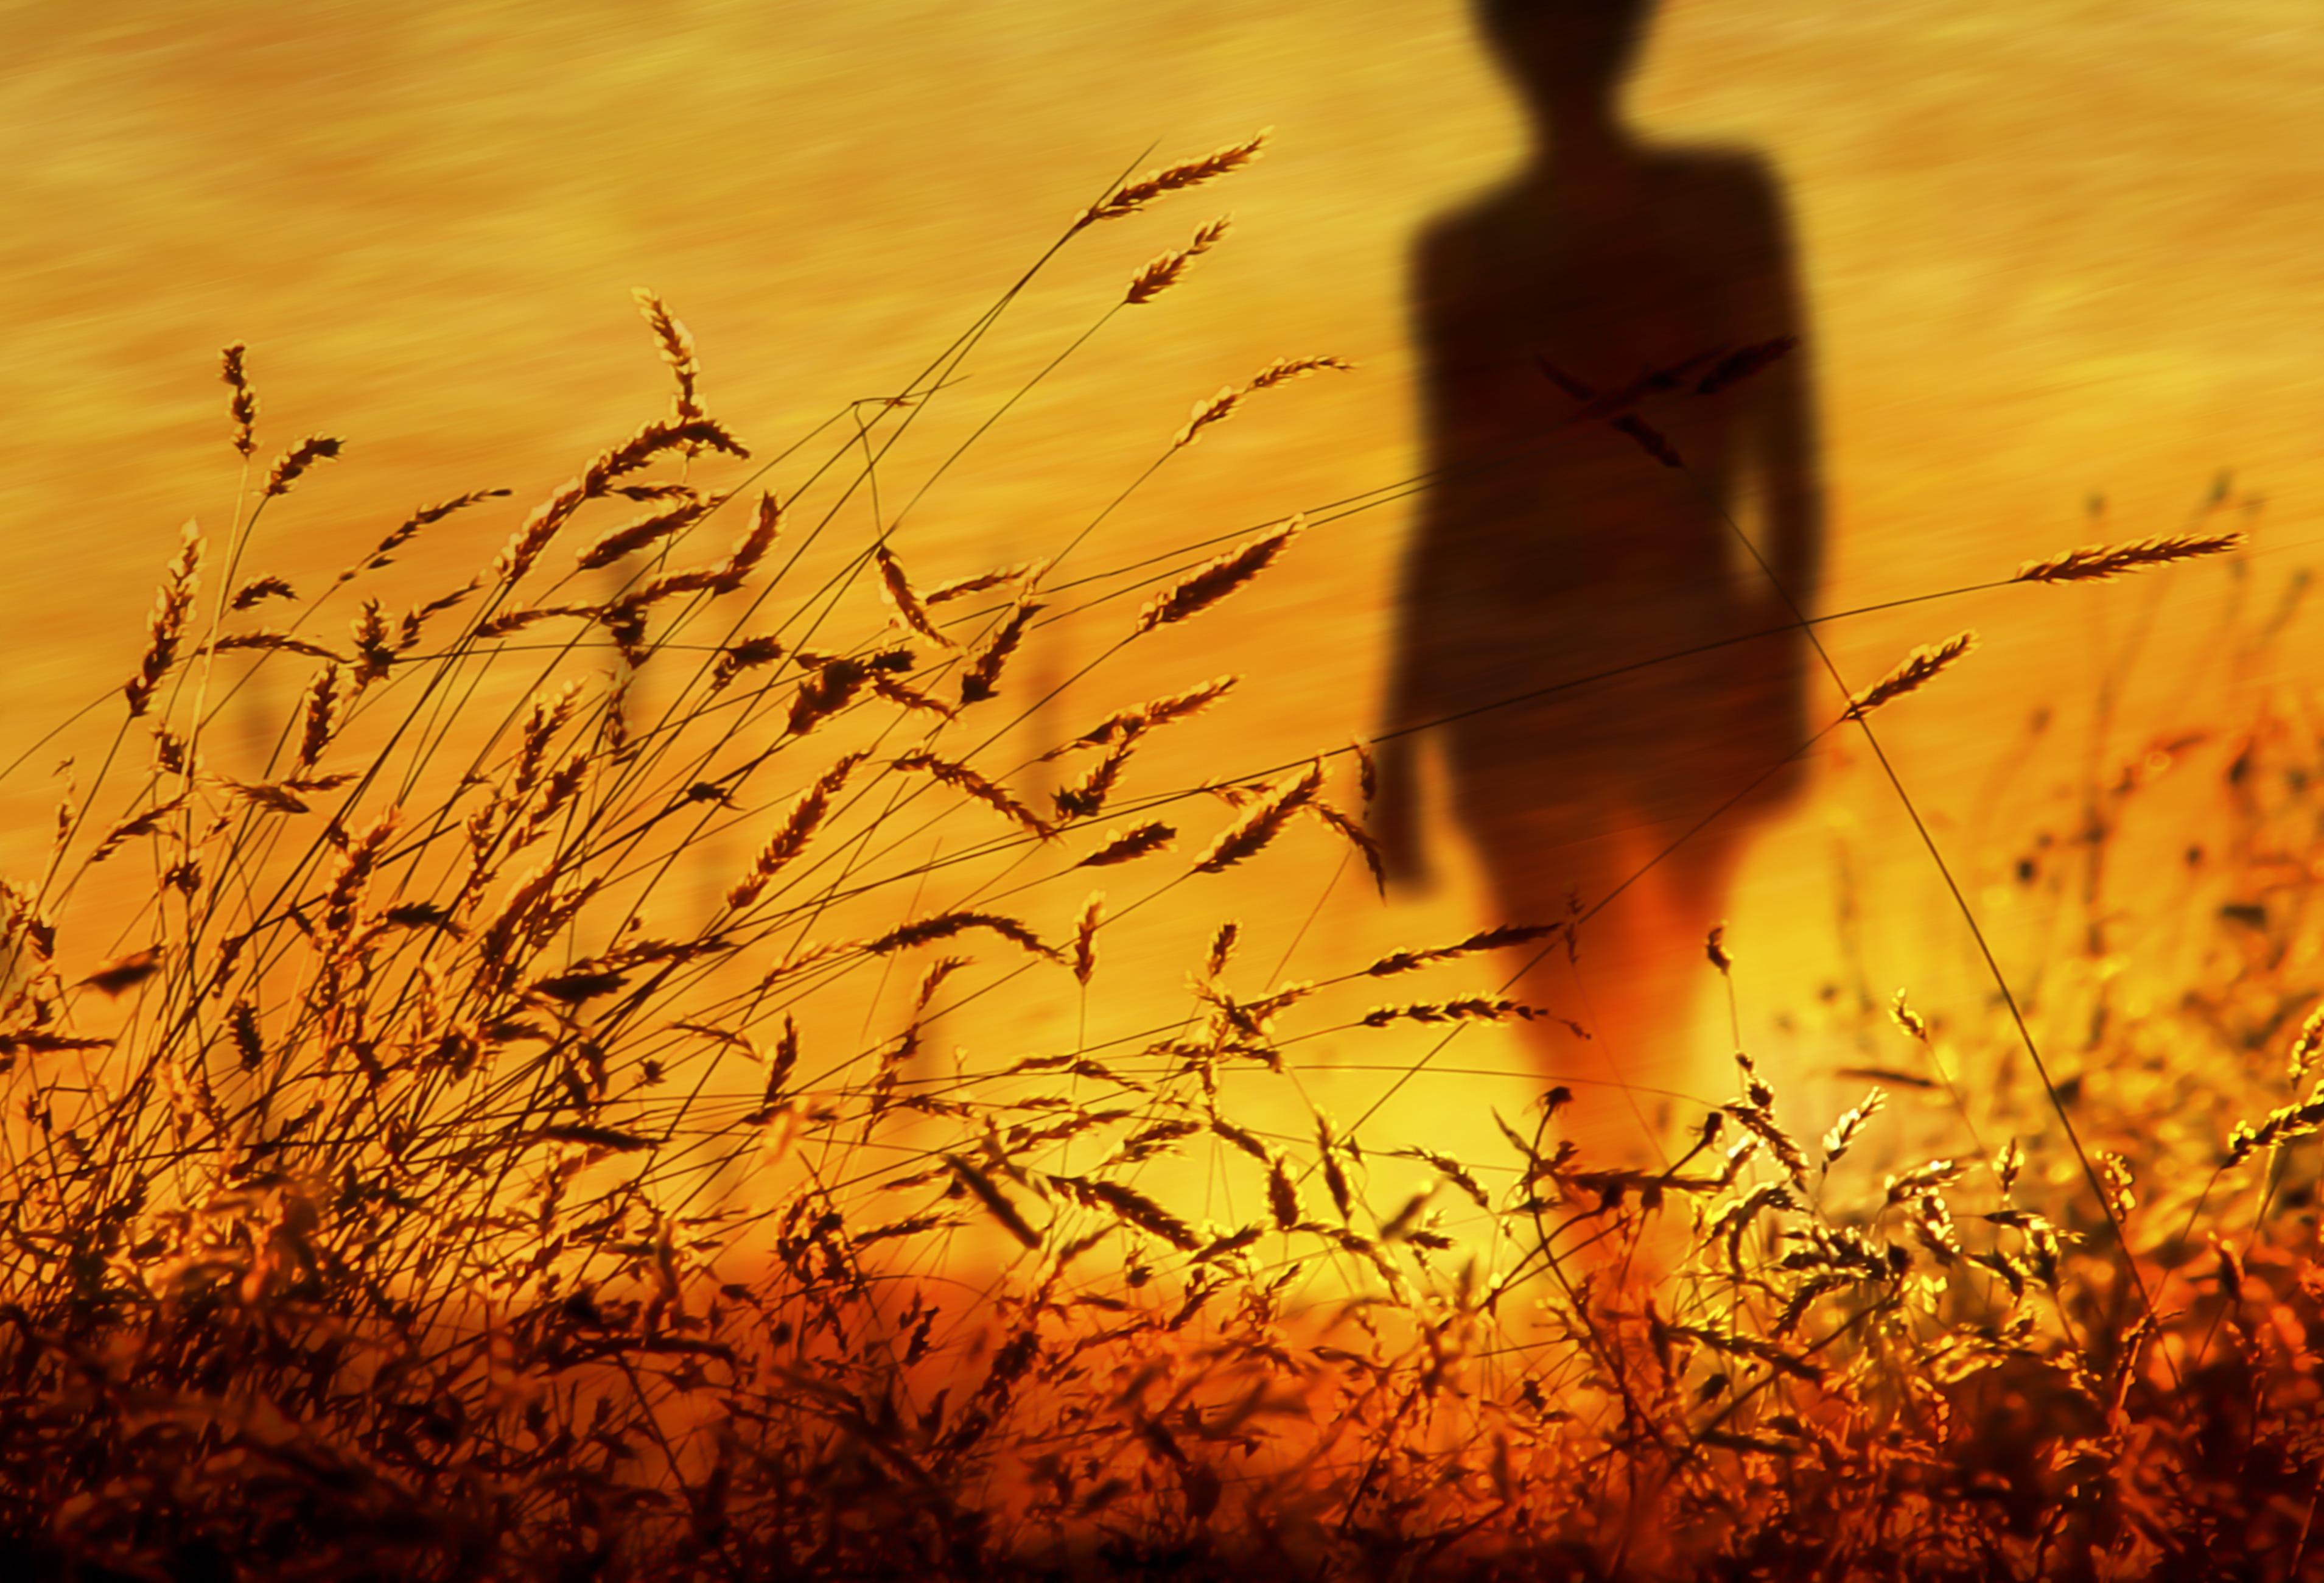 wallpaper sunlight colorful sunset nature reflection